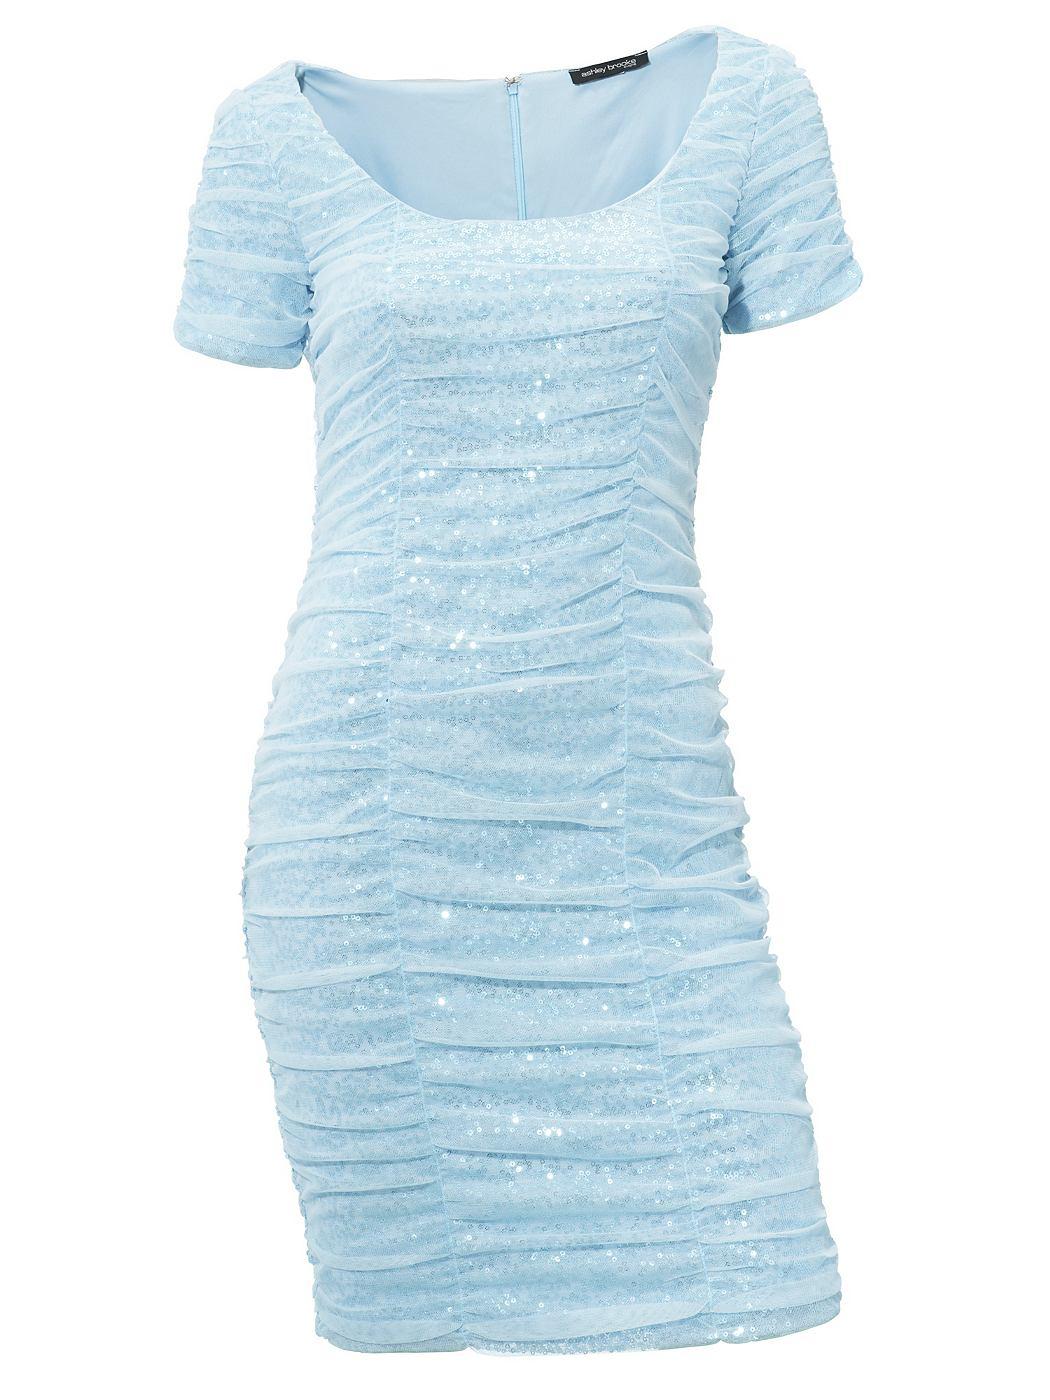 Ashley Brooke Event jurk met pailletten blauw